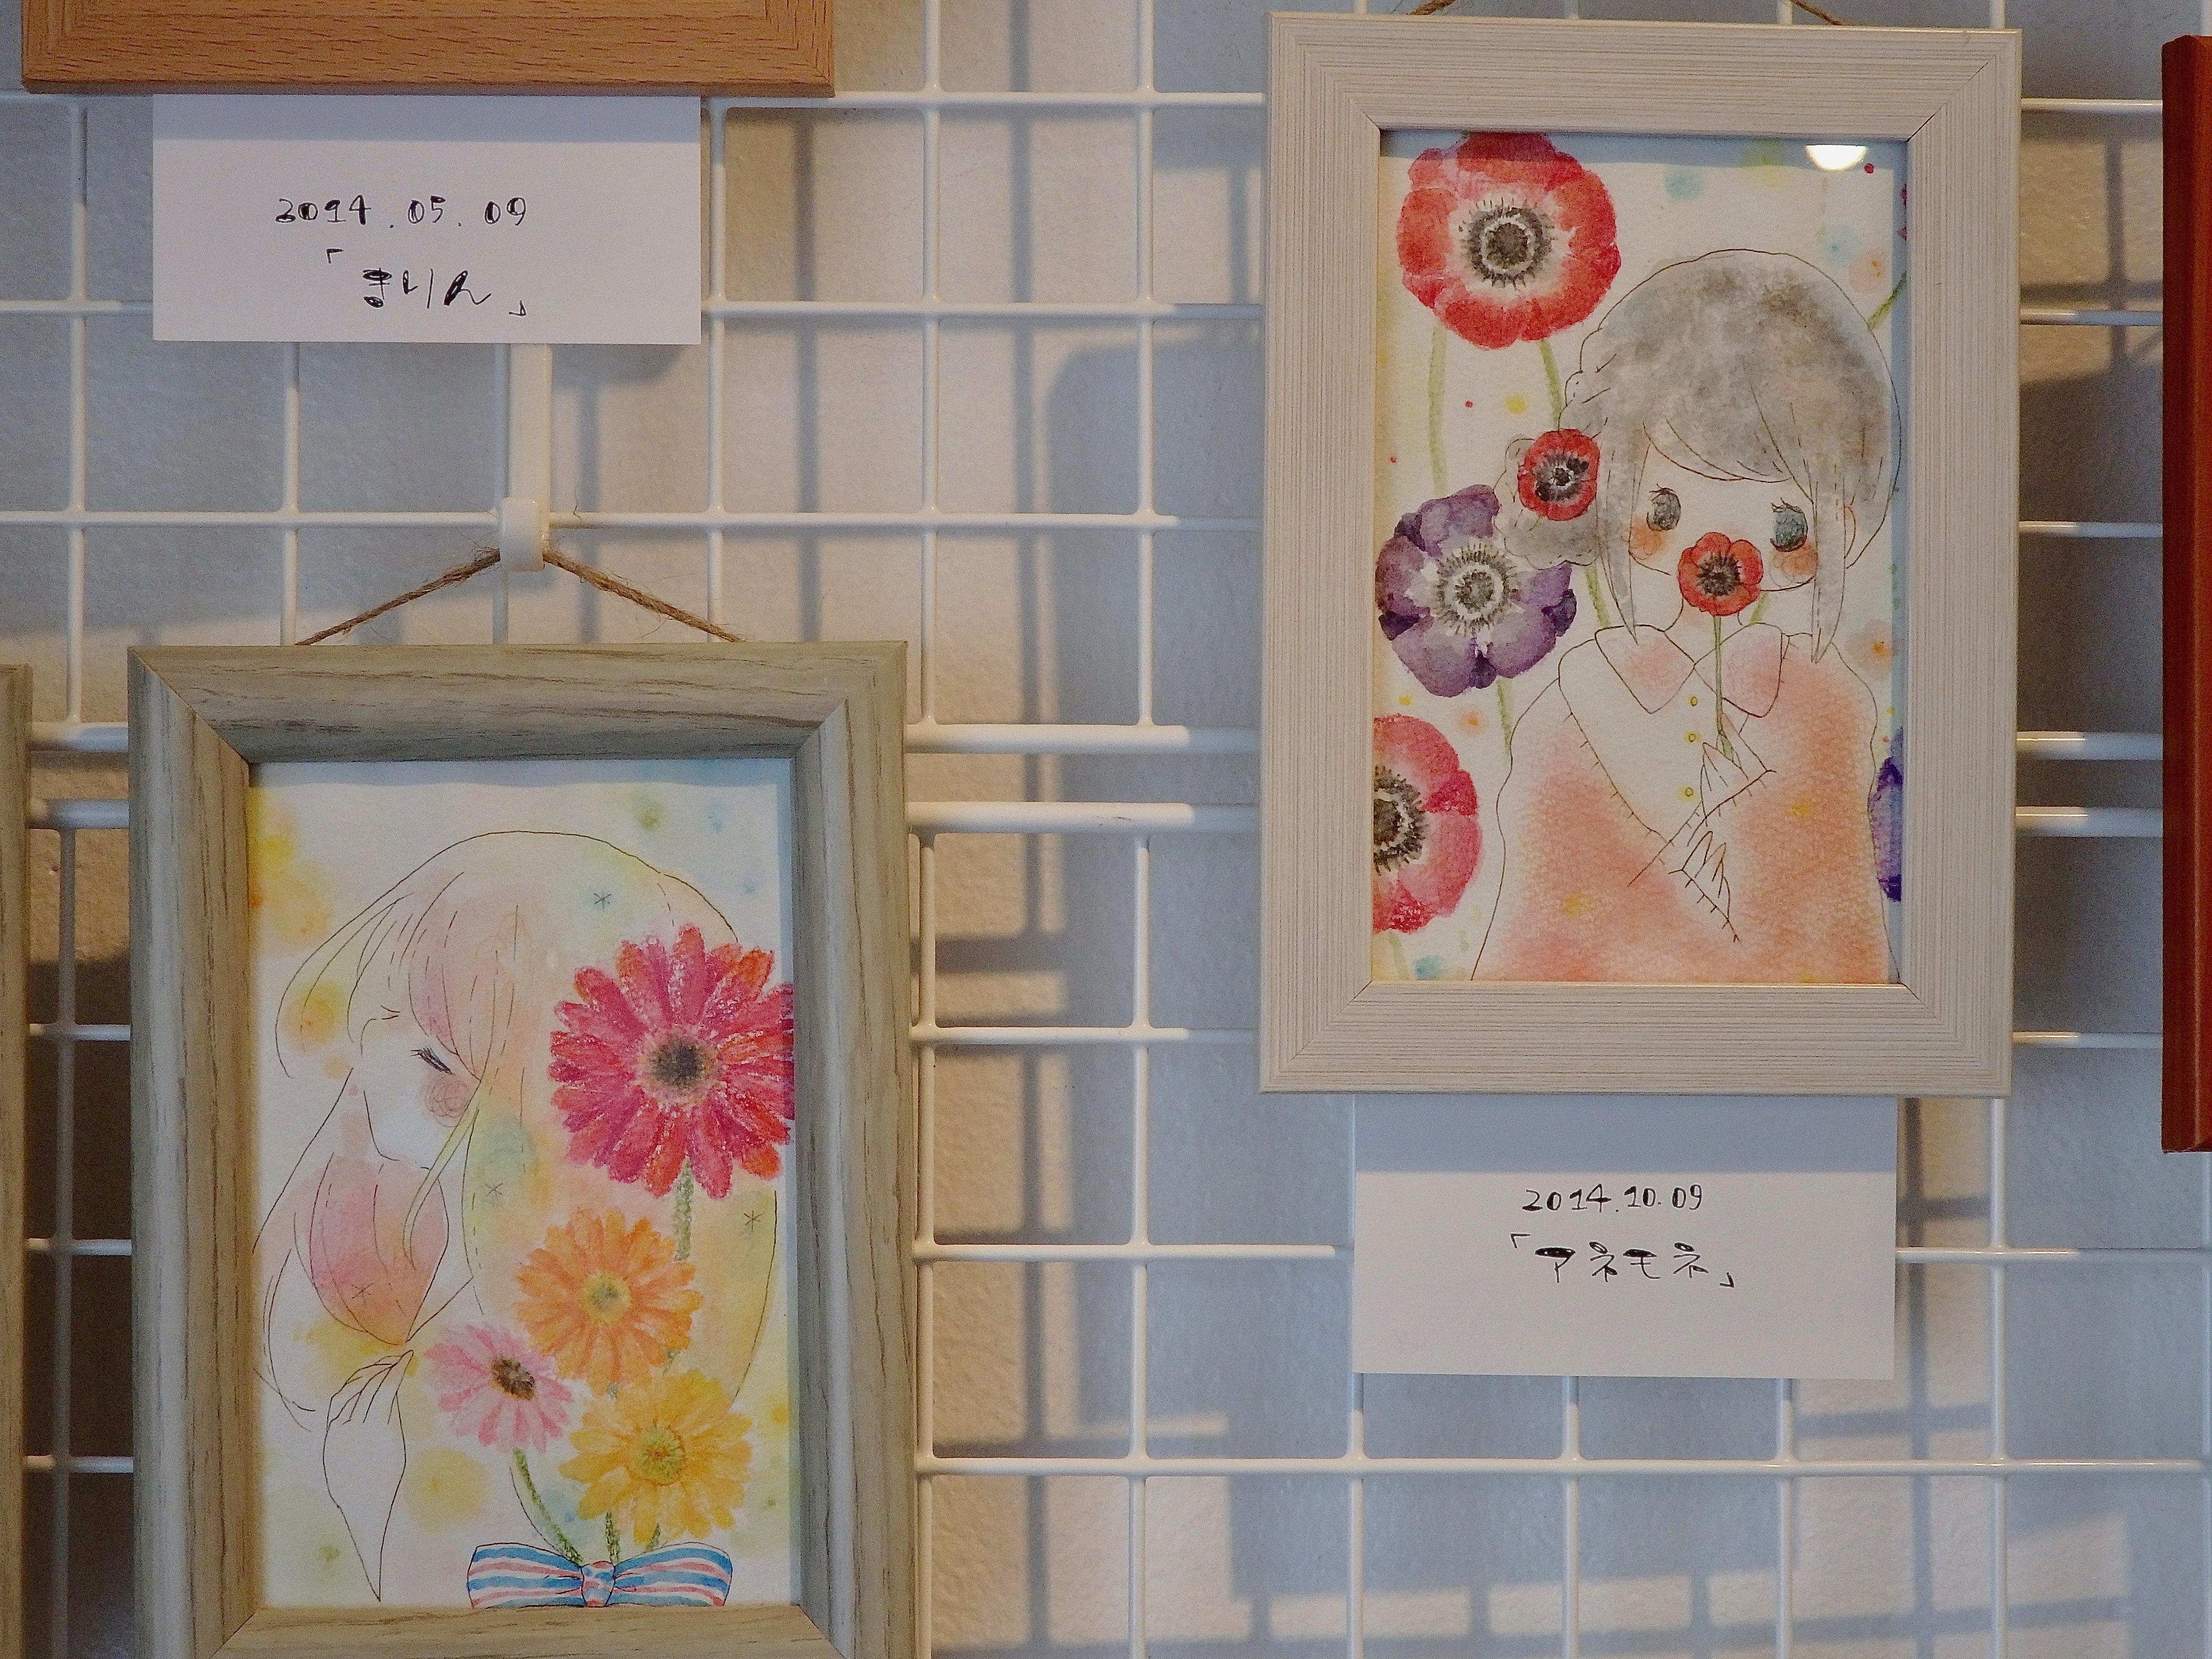 http://news.yoshimoto.co.jp/20170803183105-78acfe204826a51fdf04c592e6b1a5708dfa51ff.jpg